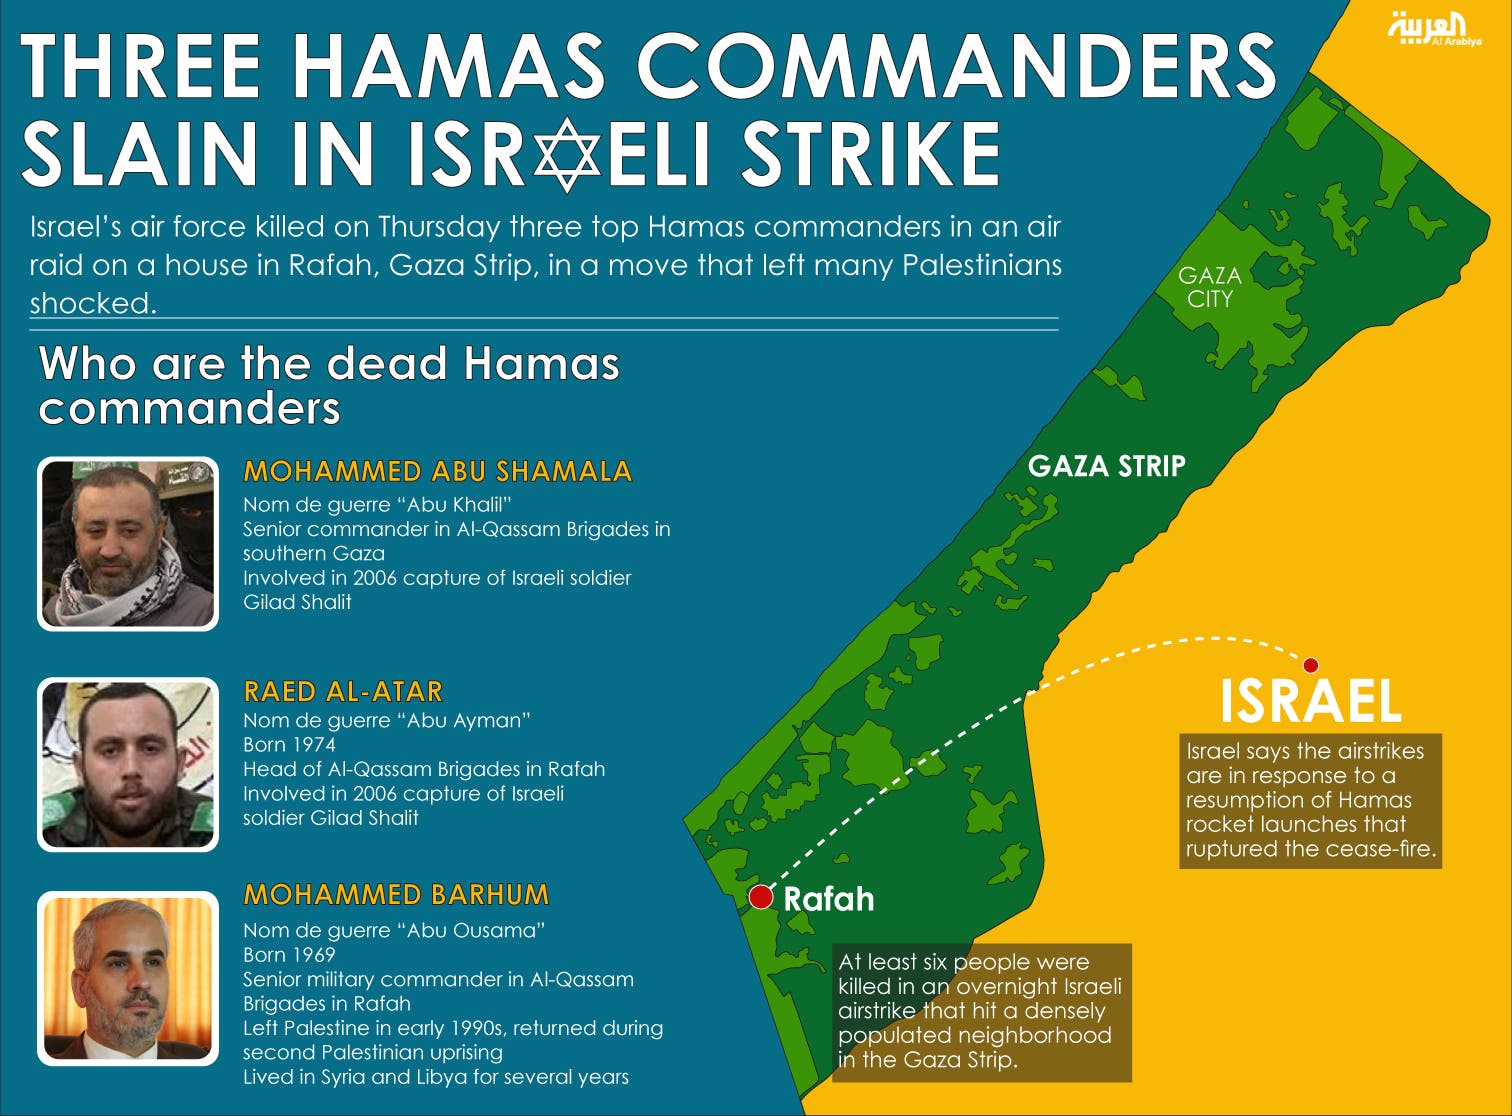 Infographic: Three Hamas commanders slain in Israeli strike